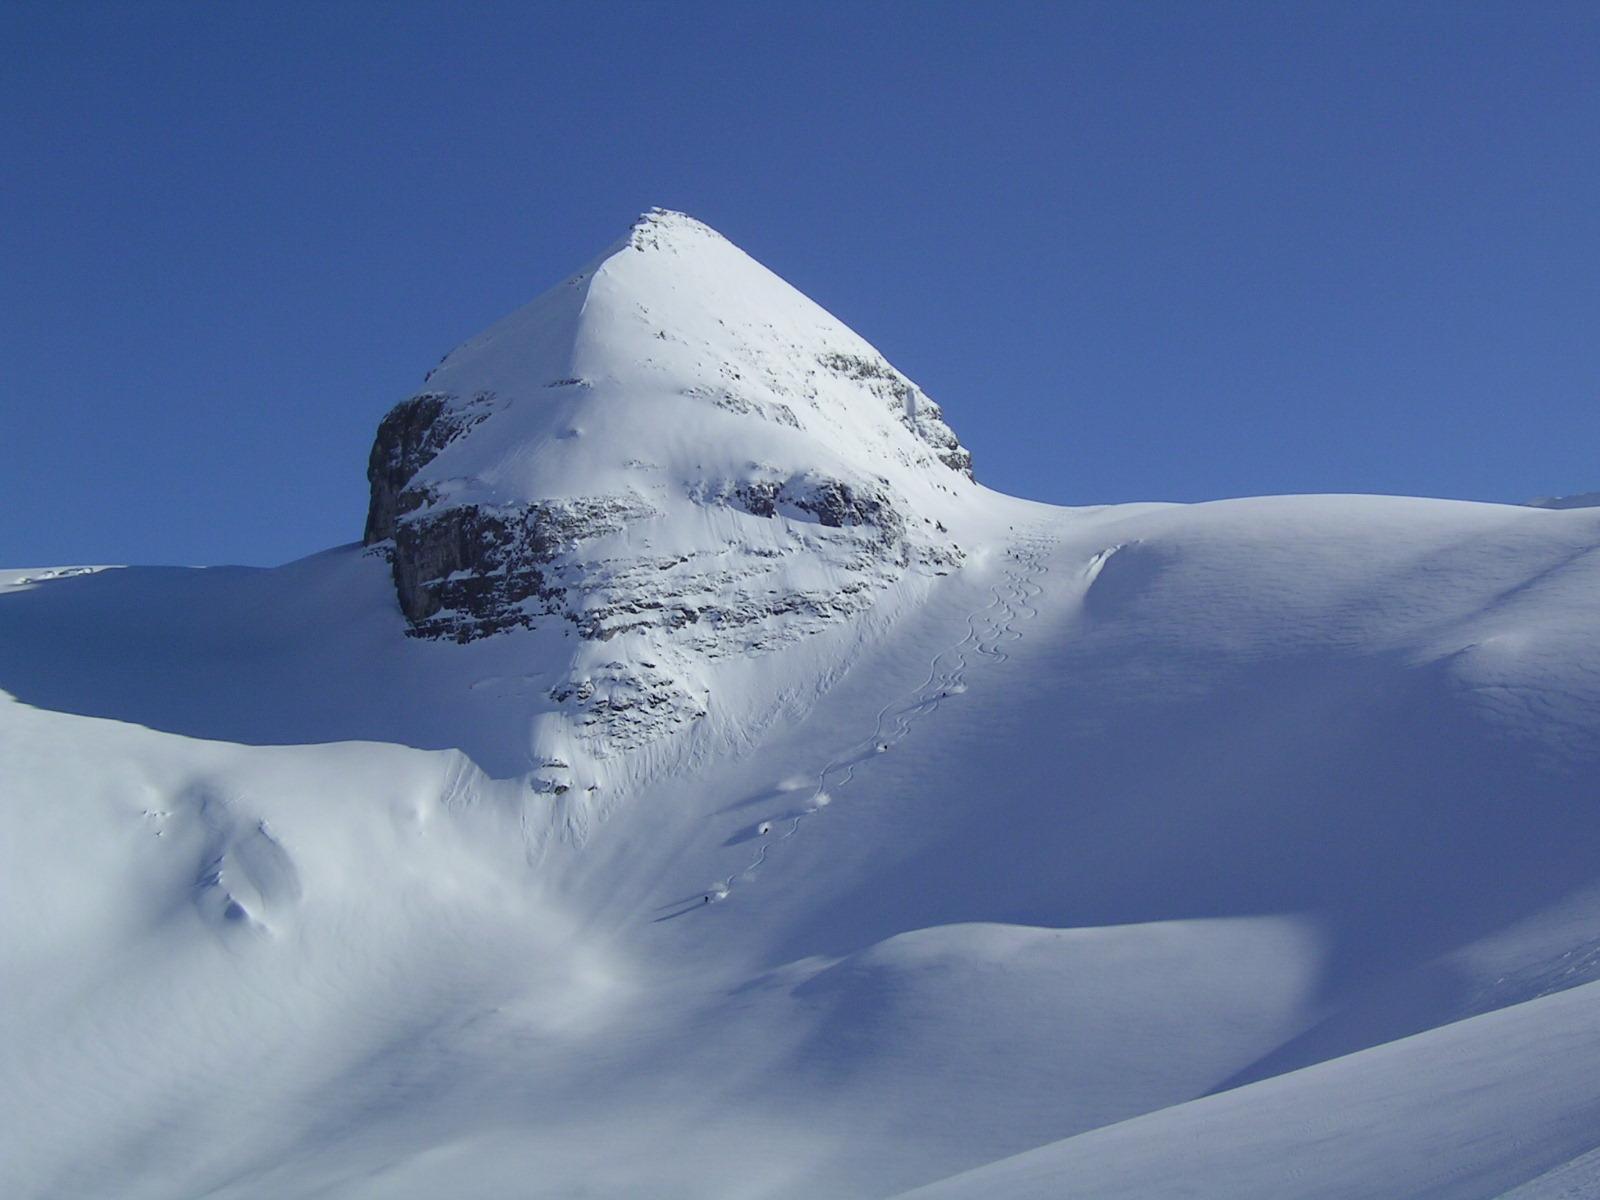 Heliskiing British Columbia Canada in March